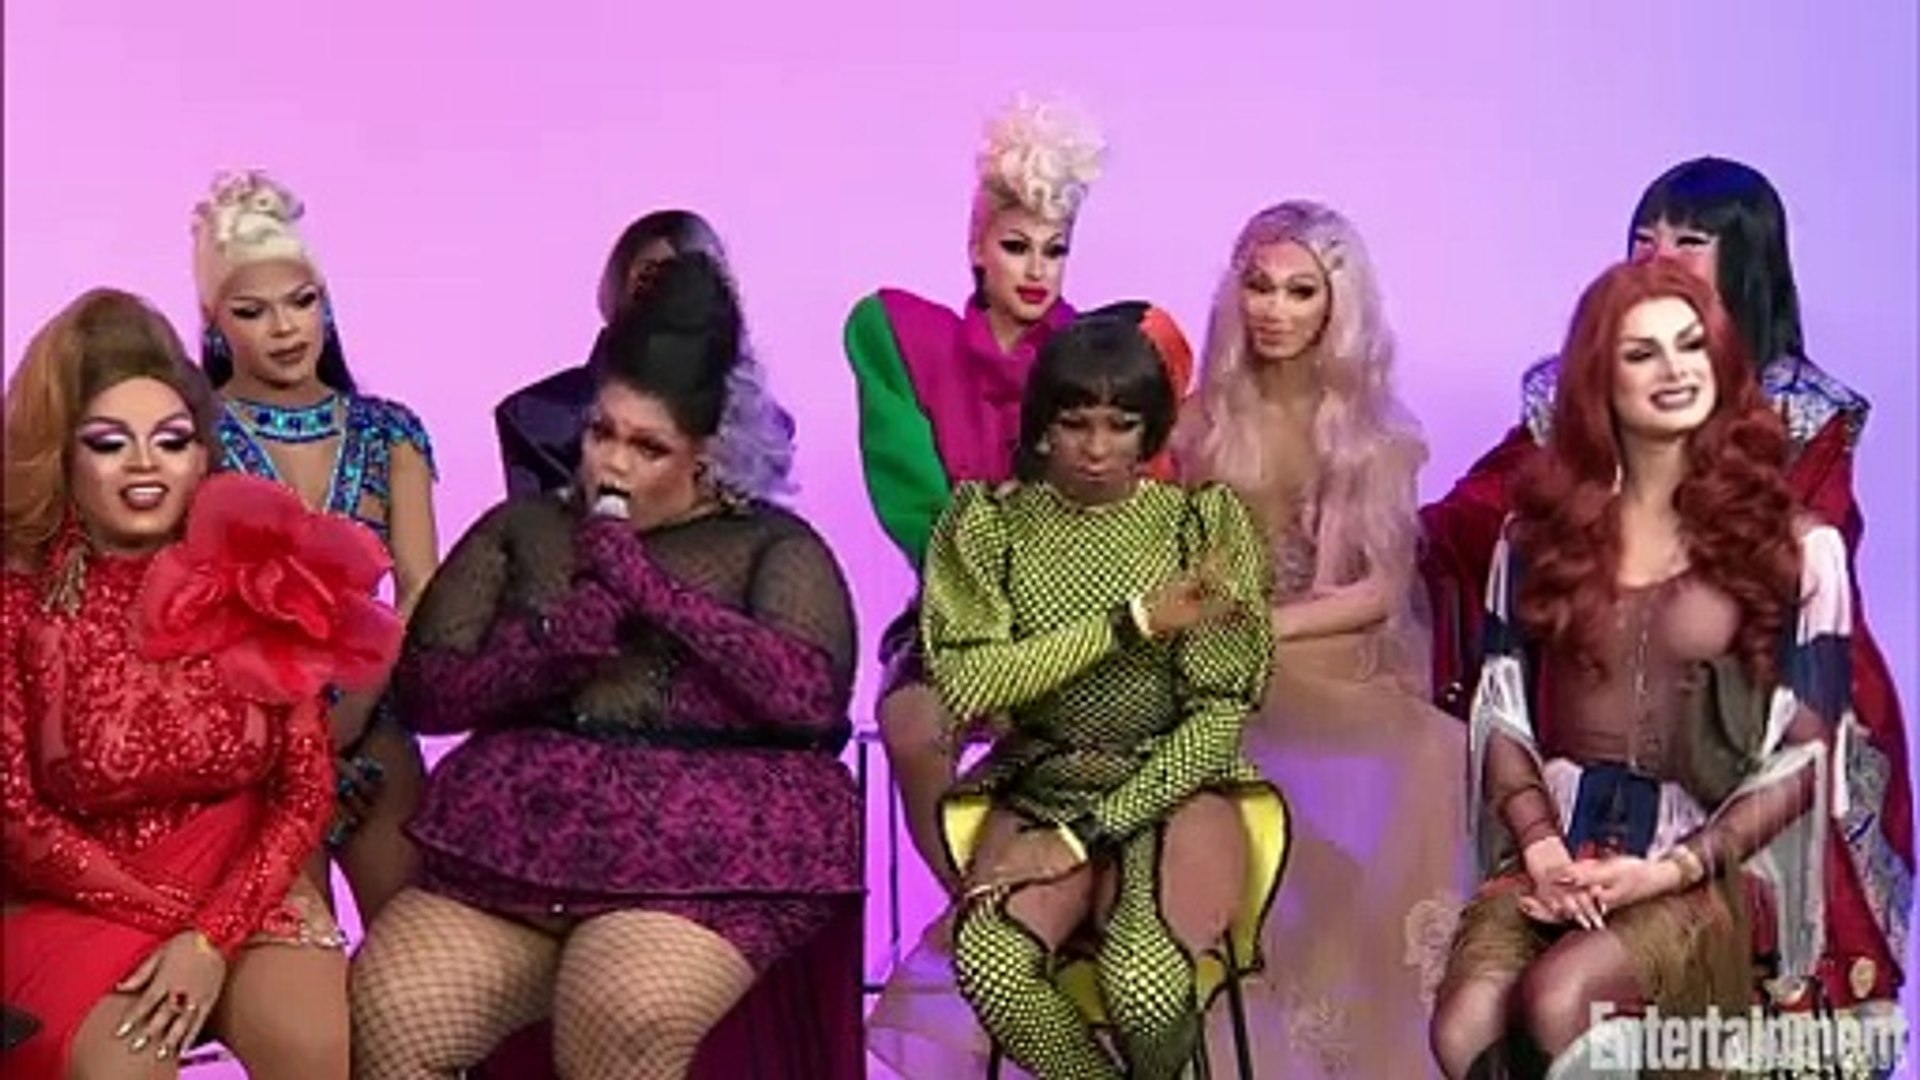 'RuPaul's Drag Race' Season 11 Cast Talk Representation On Upcoming Season | Entertai